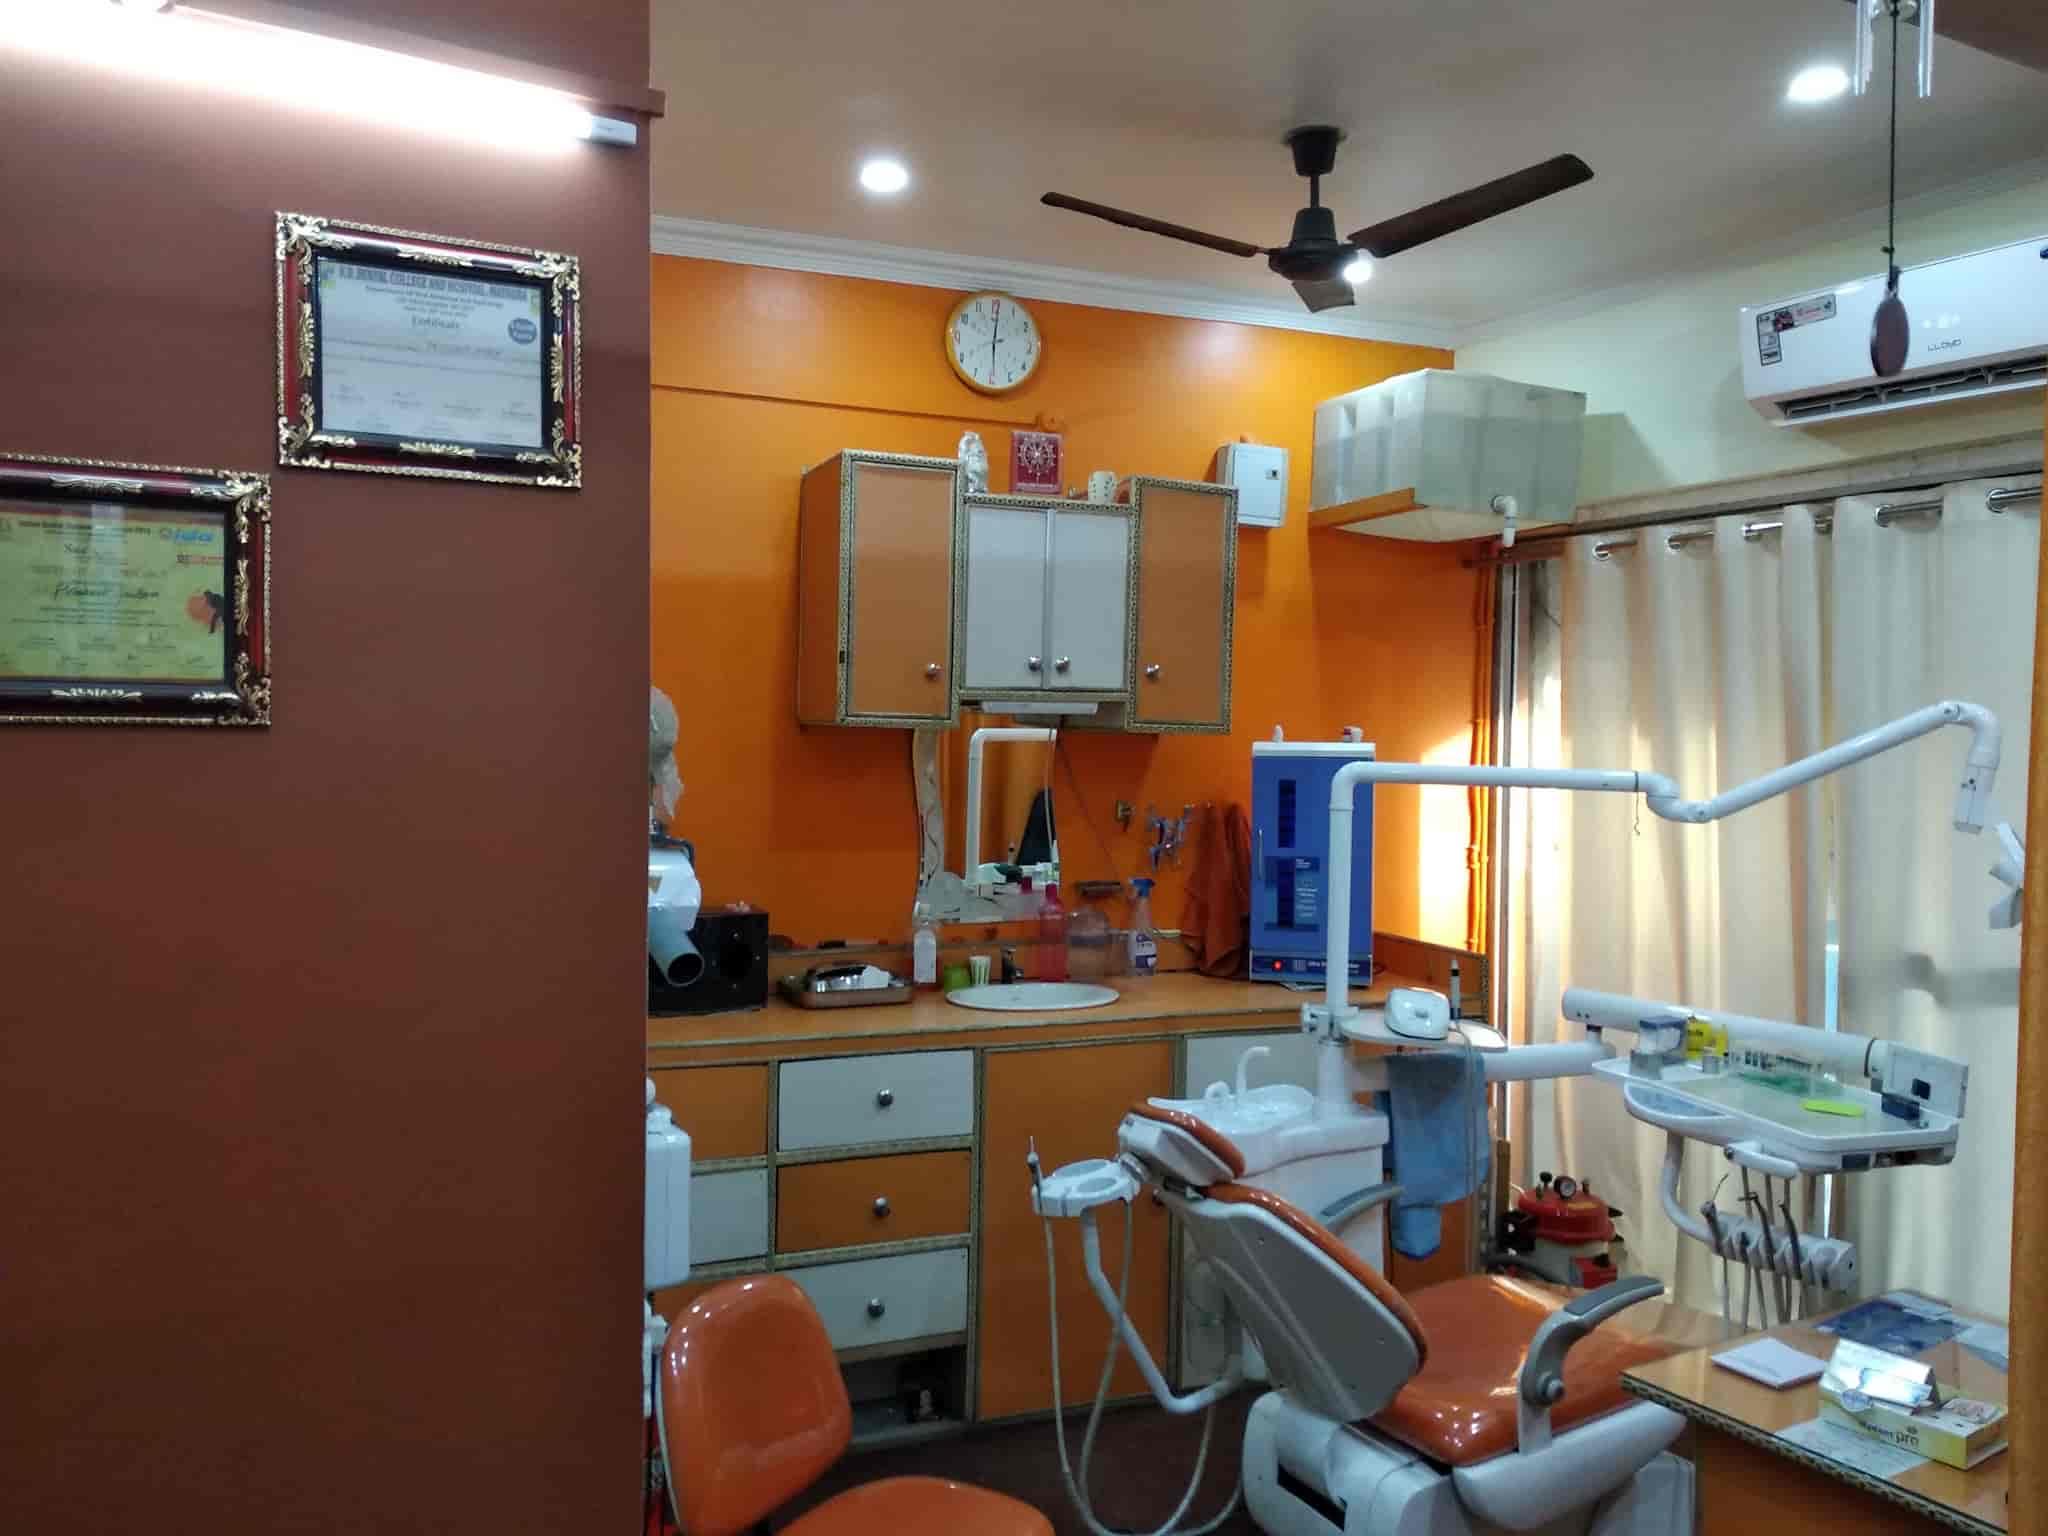 Lord Krishna Tooth Care Centre Photos, Sri Bankey Bihari Ji